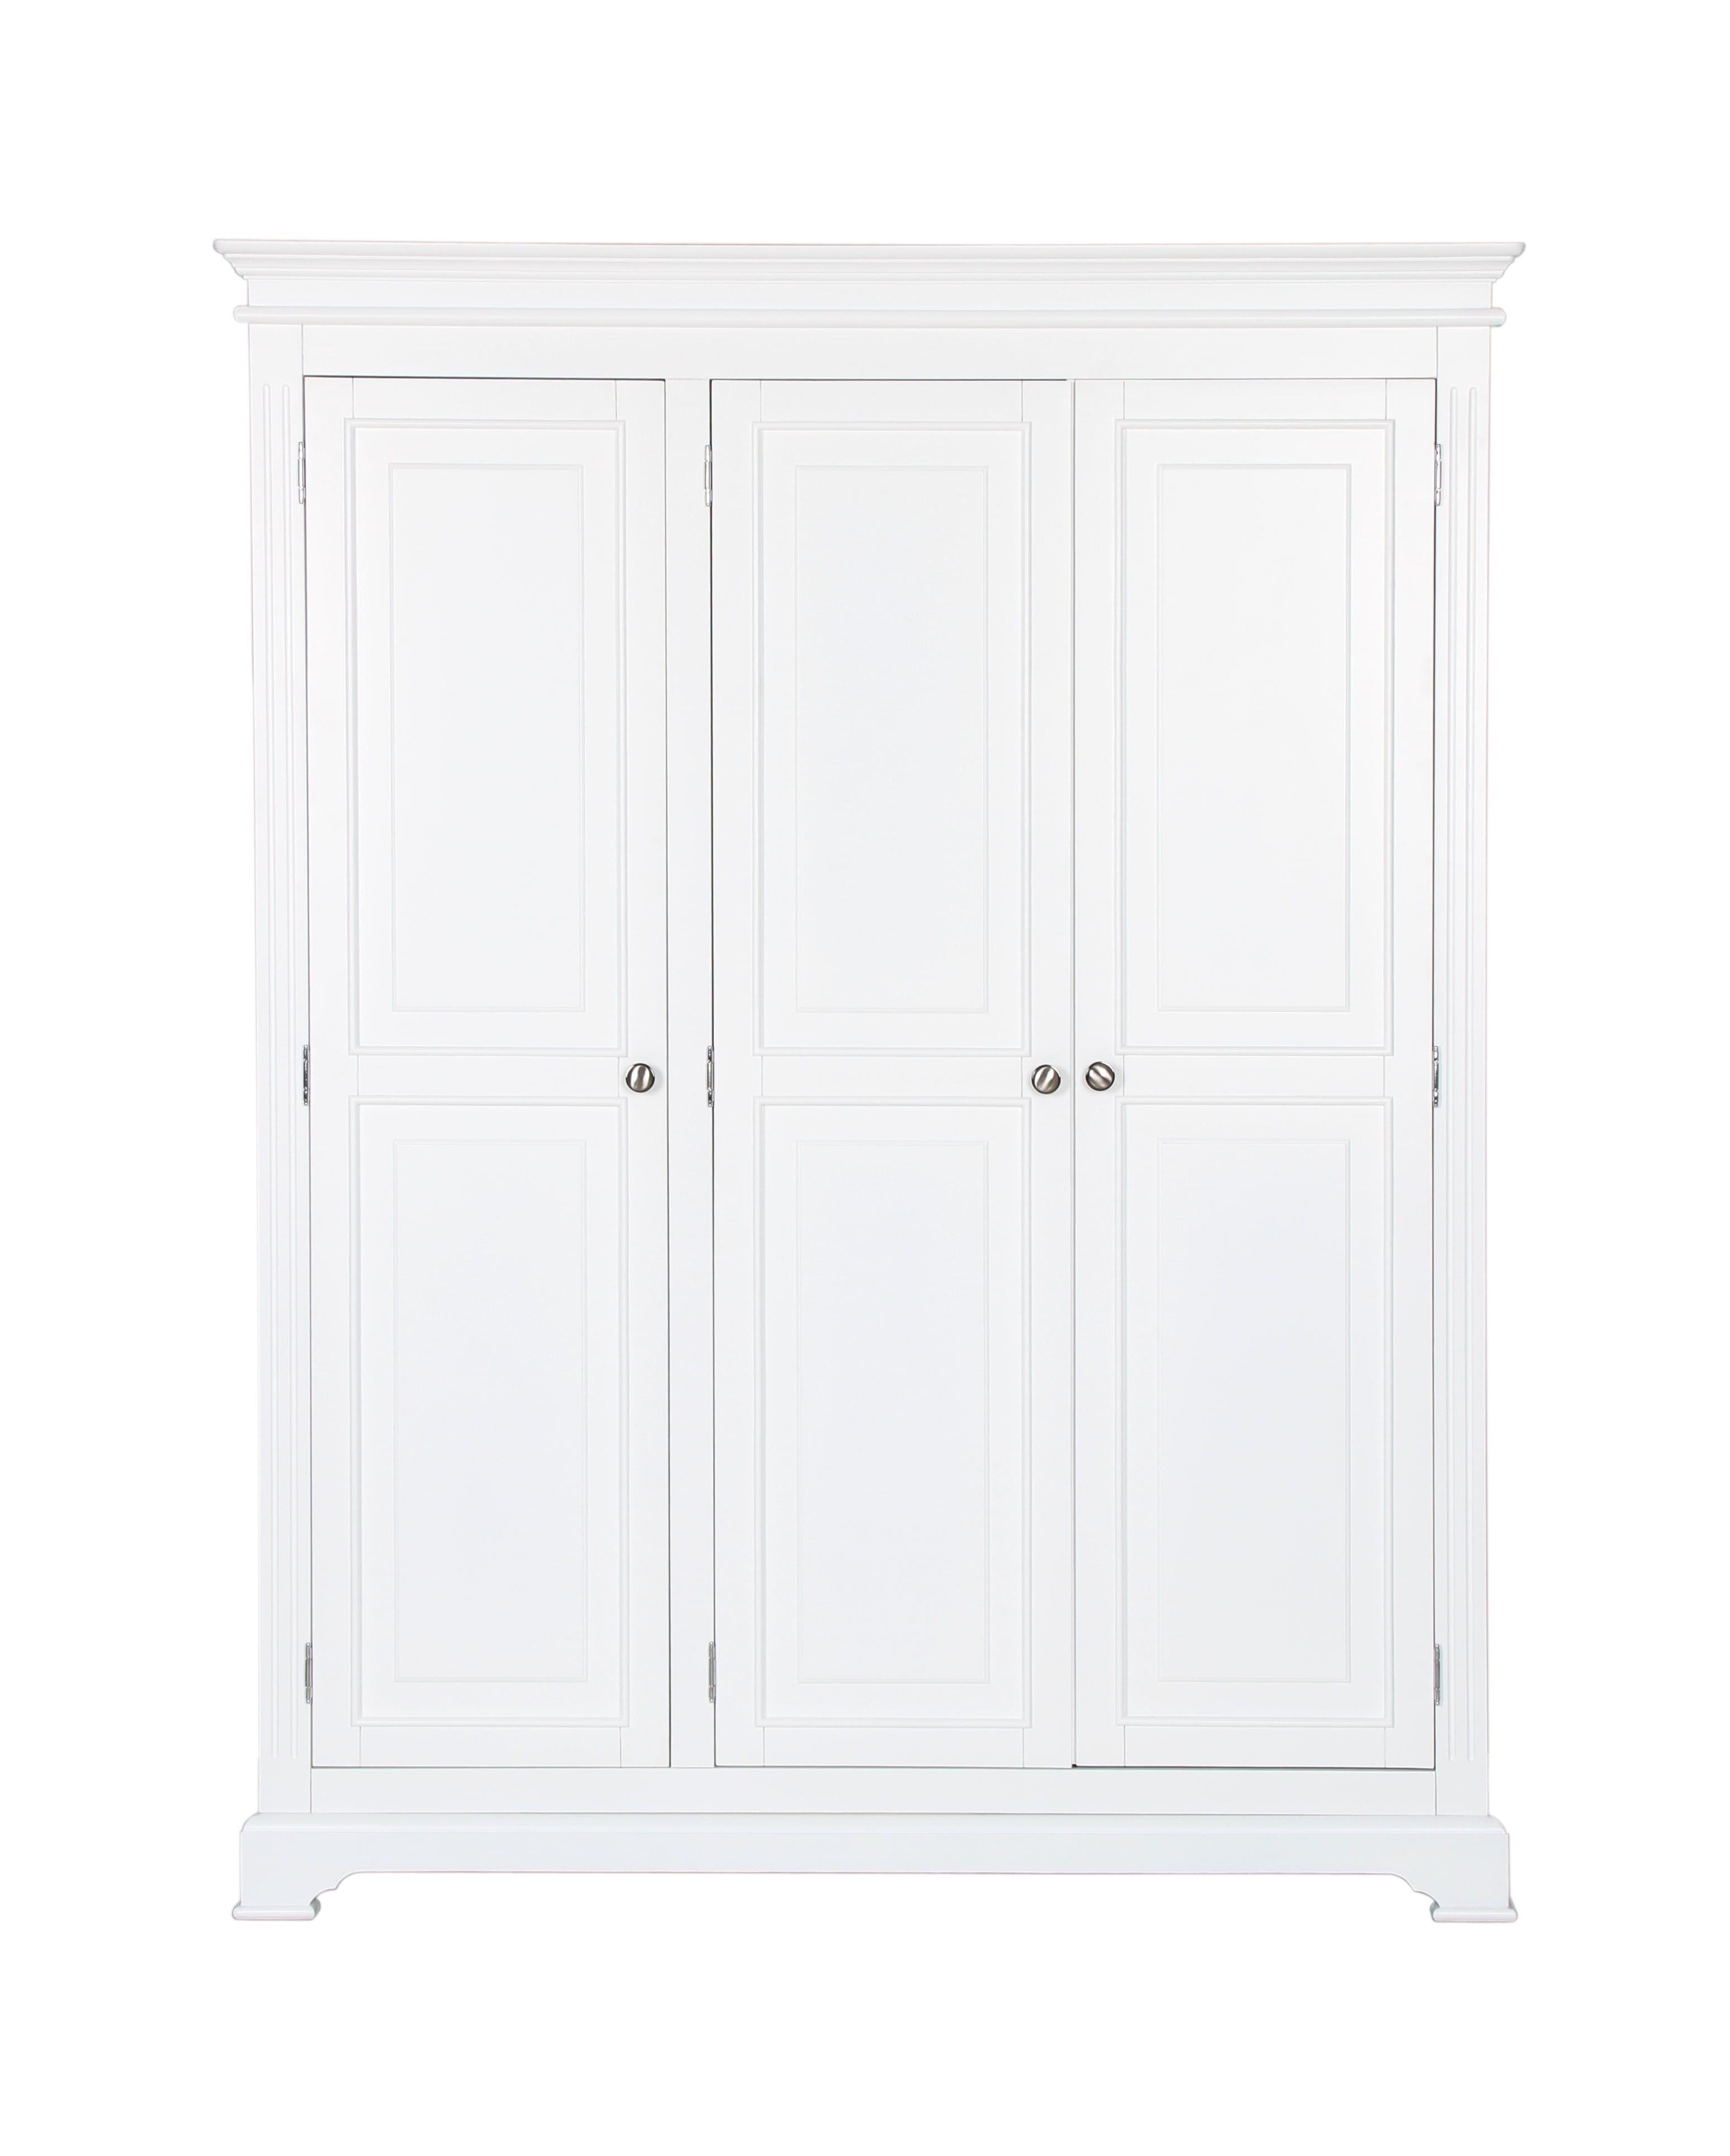 White 3 Door Wardrobes With Well Known Seattle 2 Door Wardrobe £ (View 7 of 15)